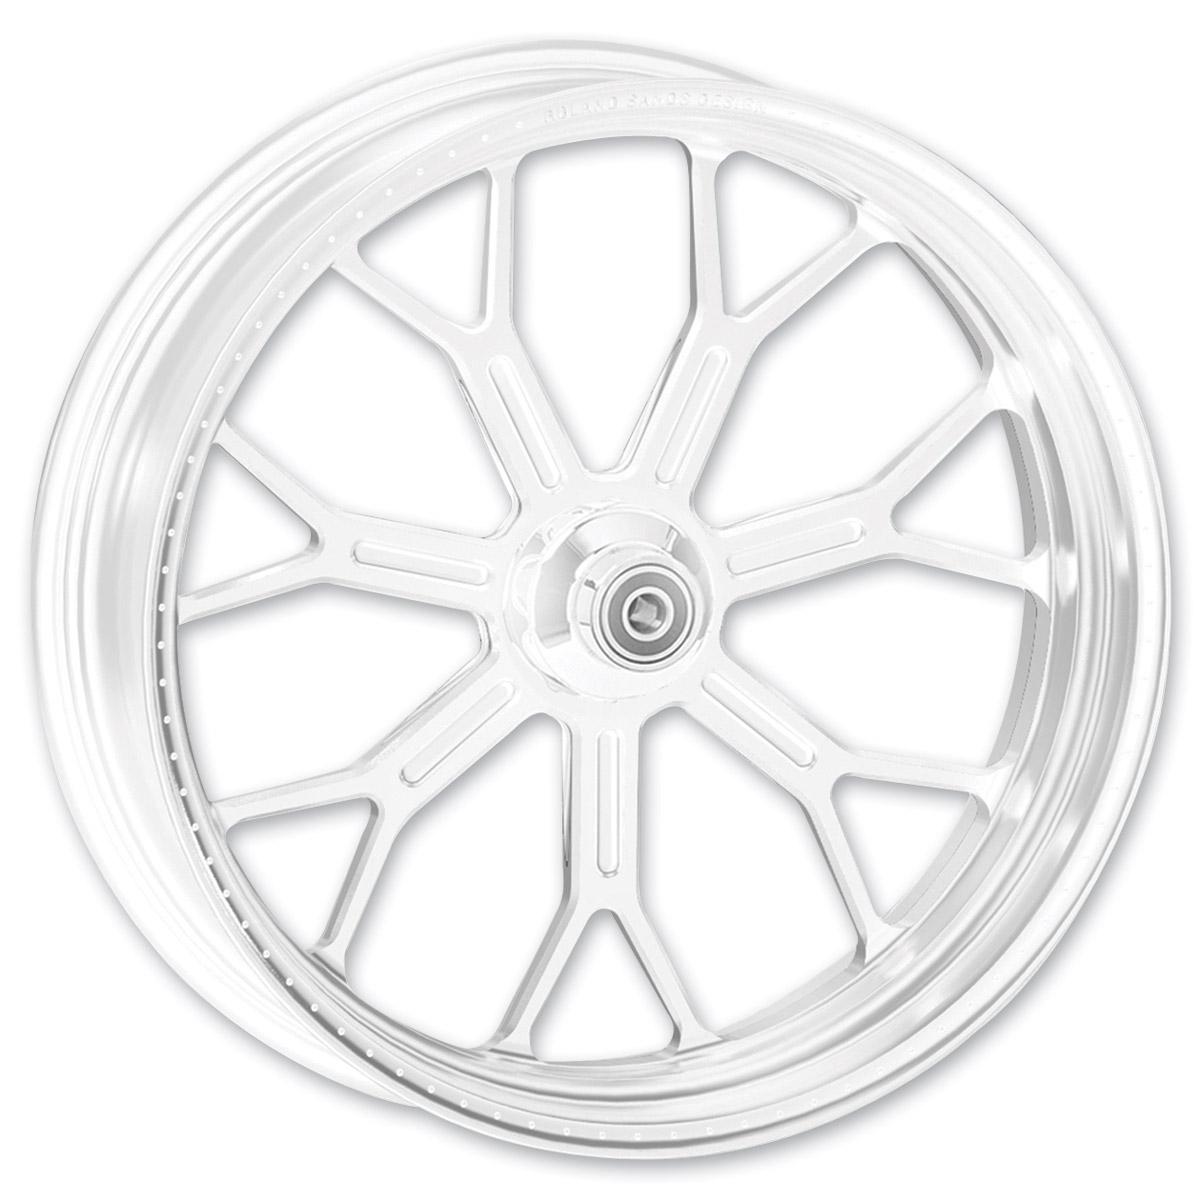 Roland Sands Design Del Mar Chrome Rear Wheel, 18″ x 4.25″